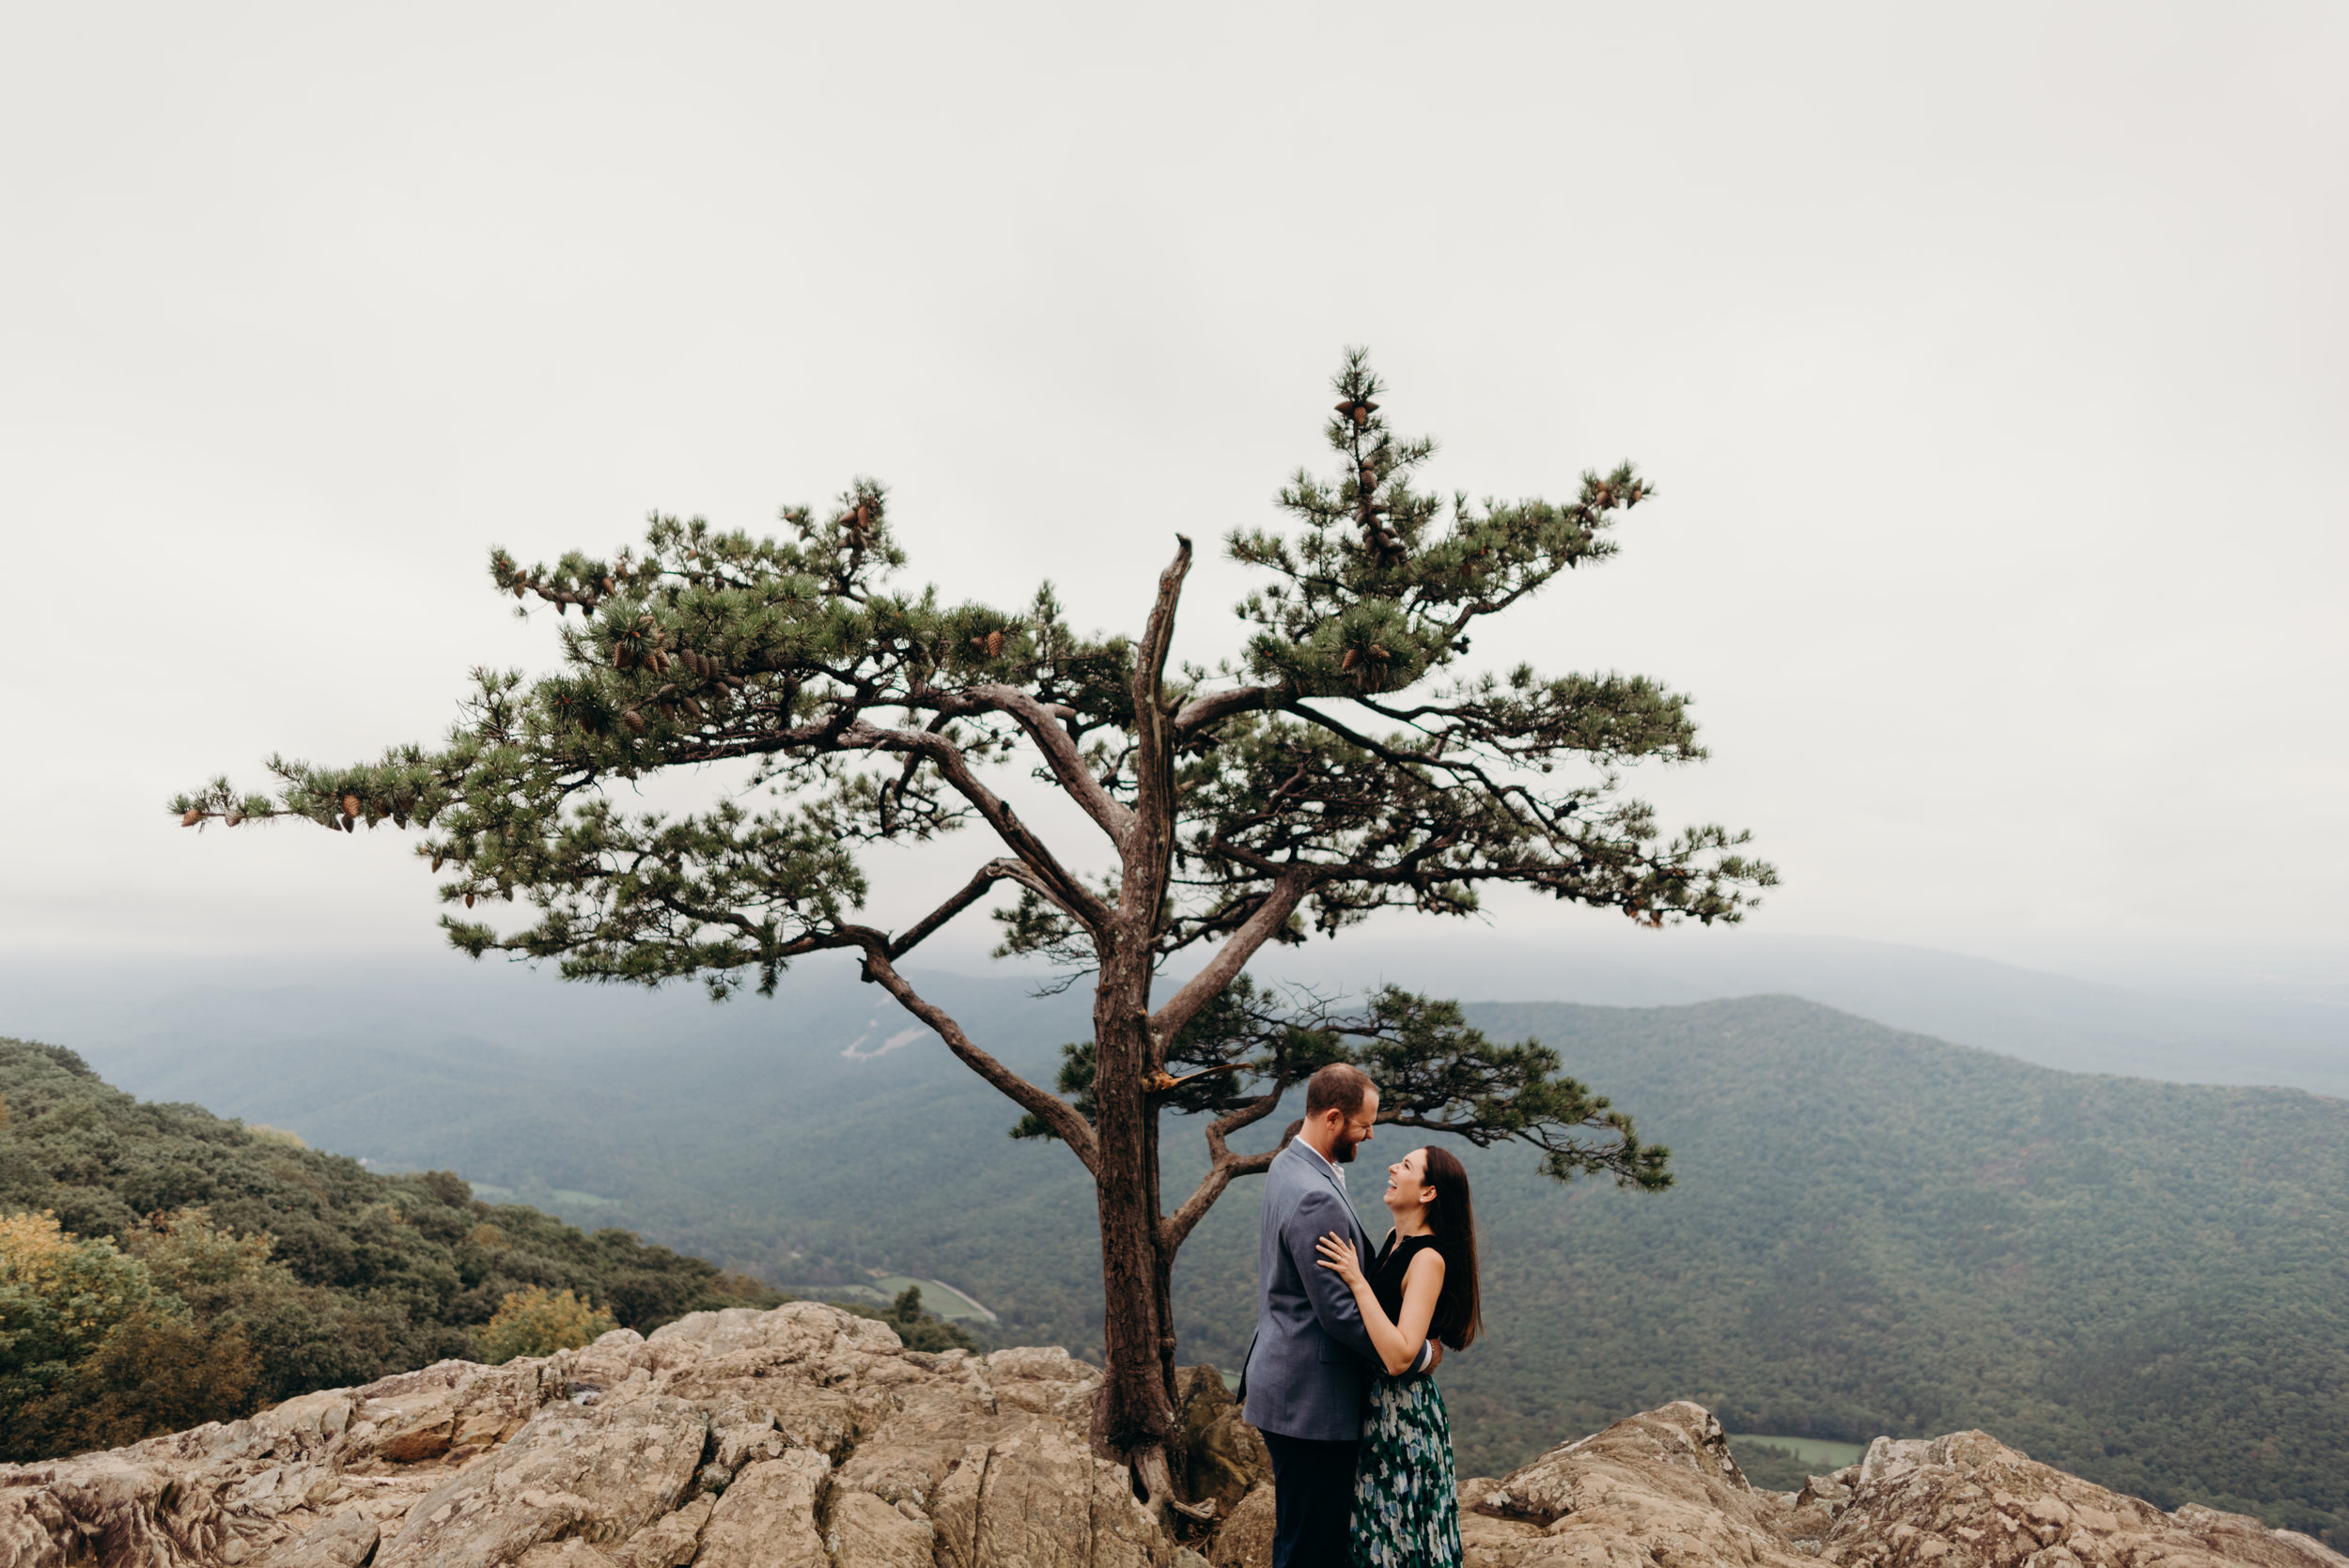 laura-chris-skyline-drive-engagement-session-virginia-wedding-photographer-lindsey-paradiso-1169.jpg